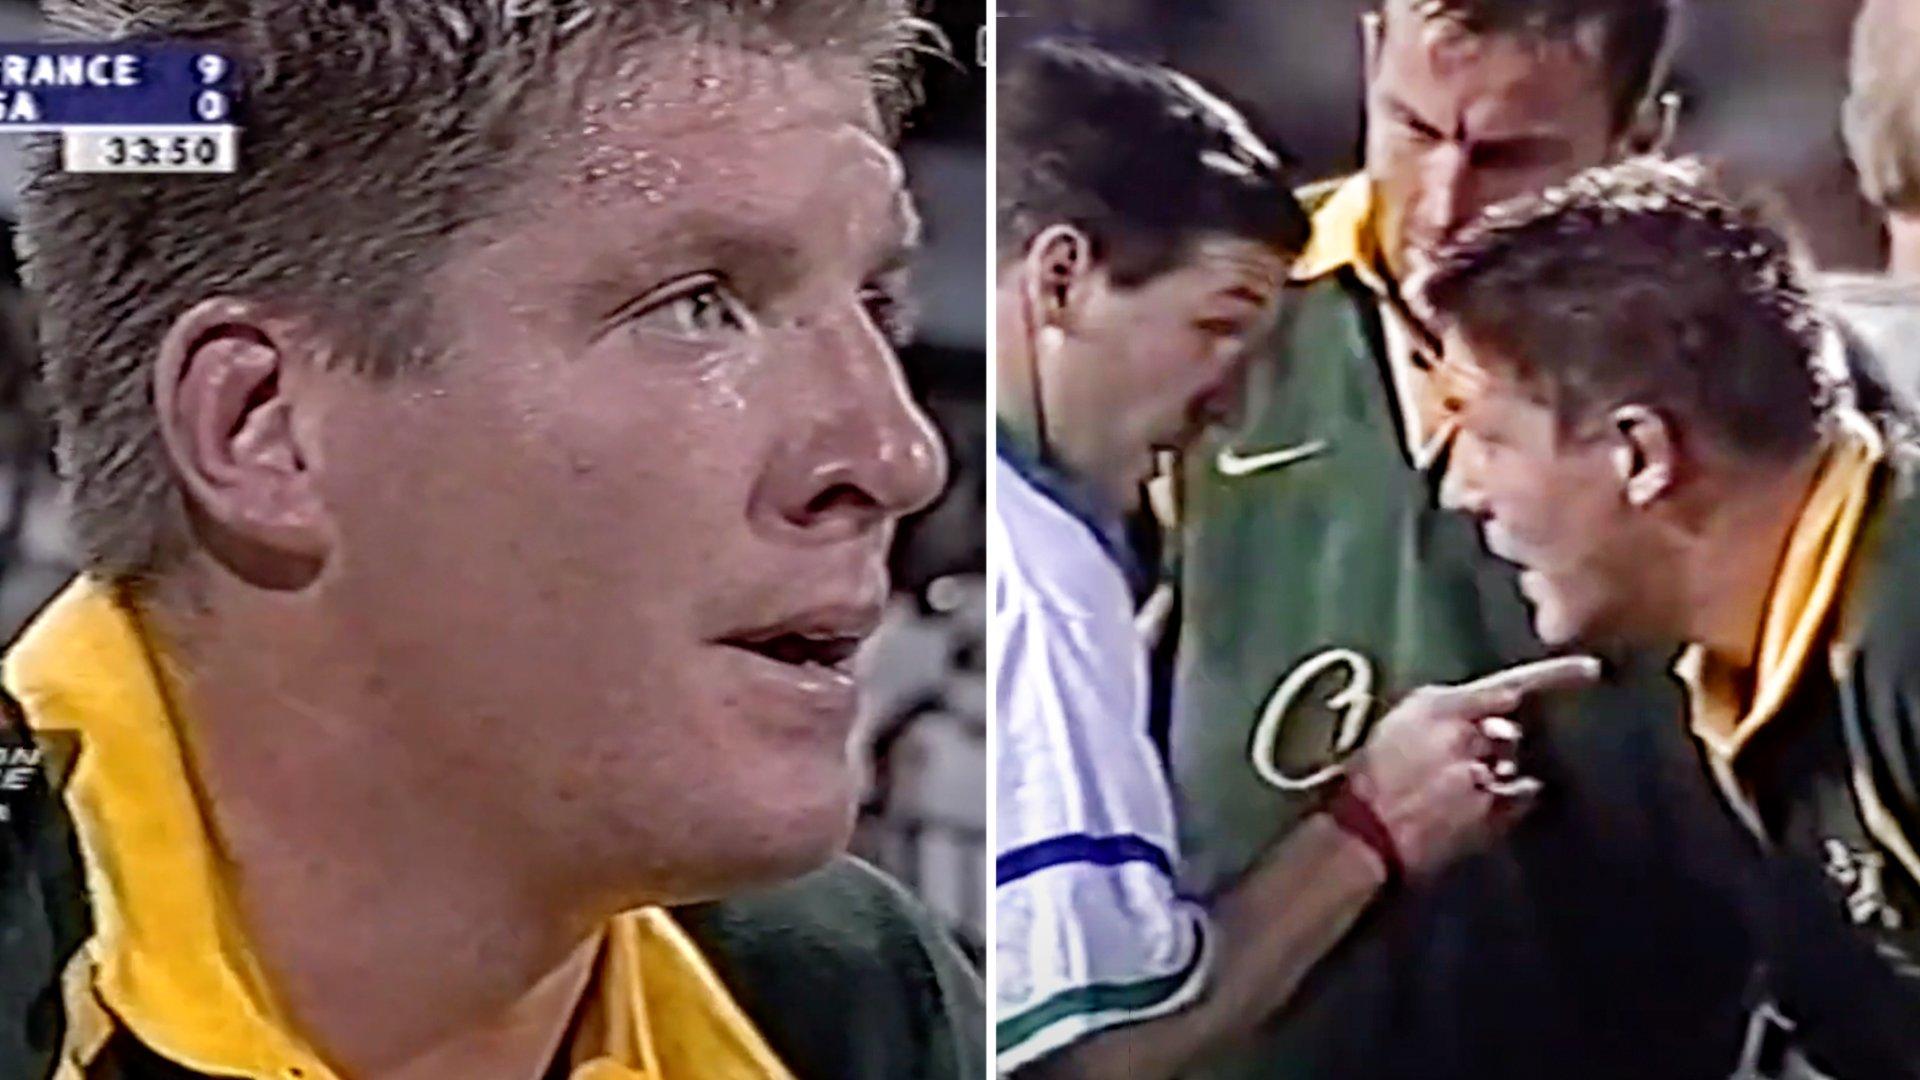 Terrifying footage of Bakkies Botha debut shows that he's always been the Enforcer